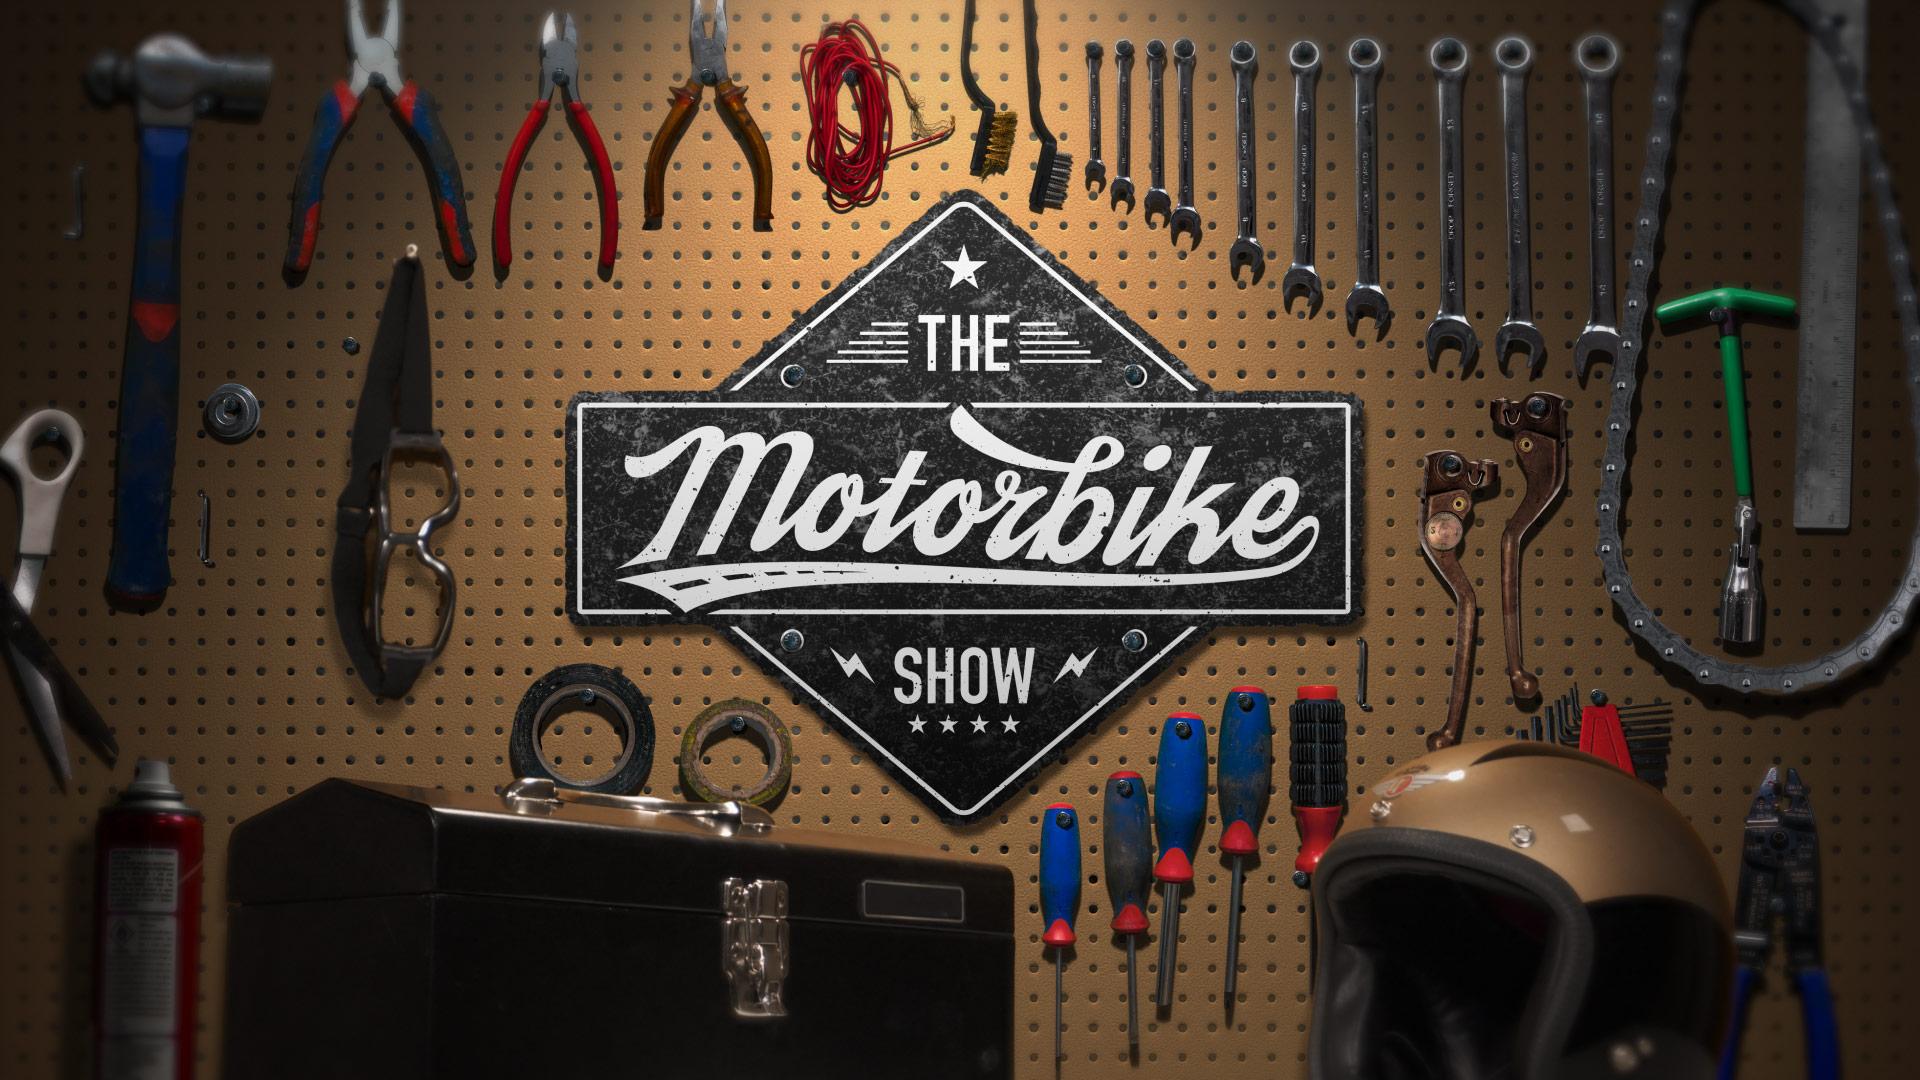 The Motorbike Show © Holey & Moley Ltd HCA Entertainment